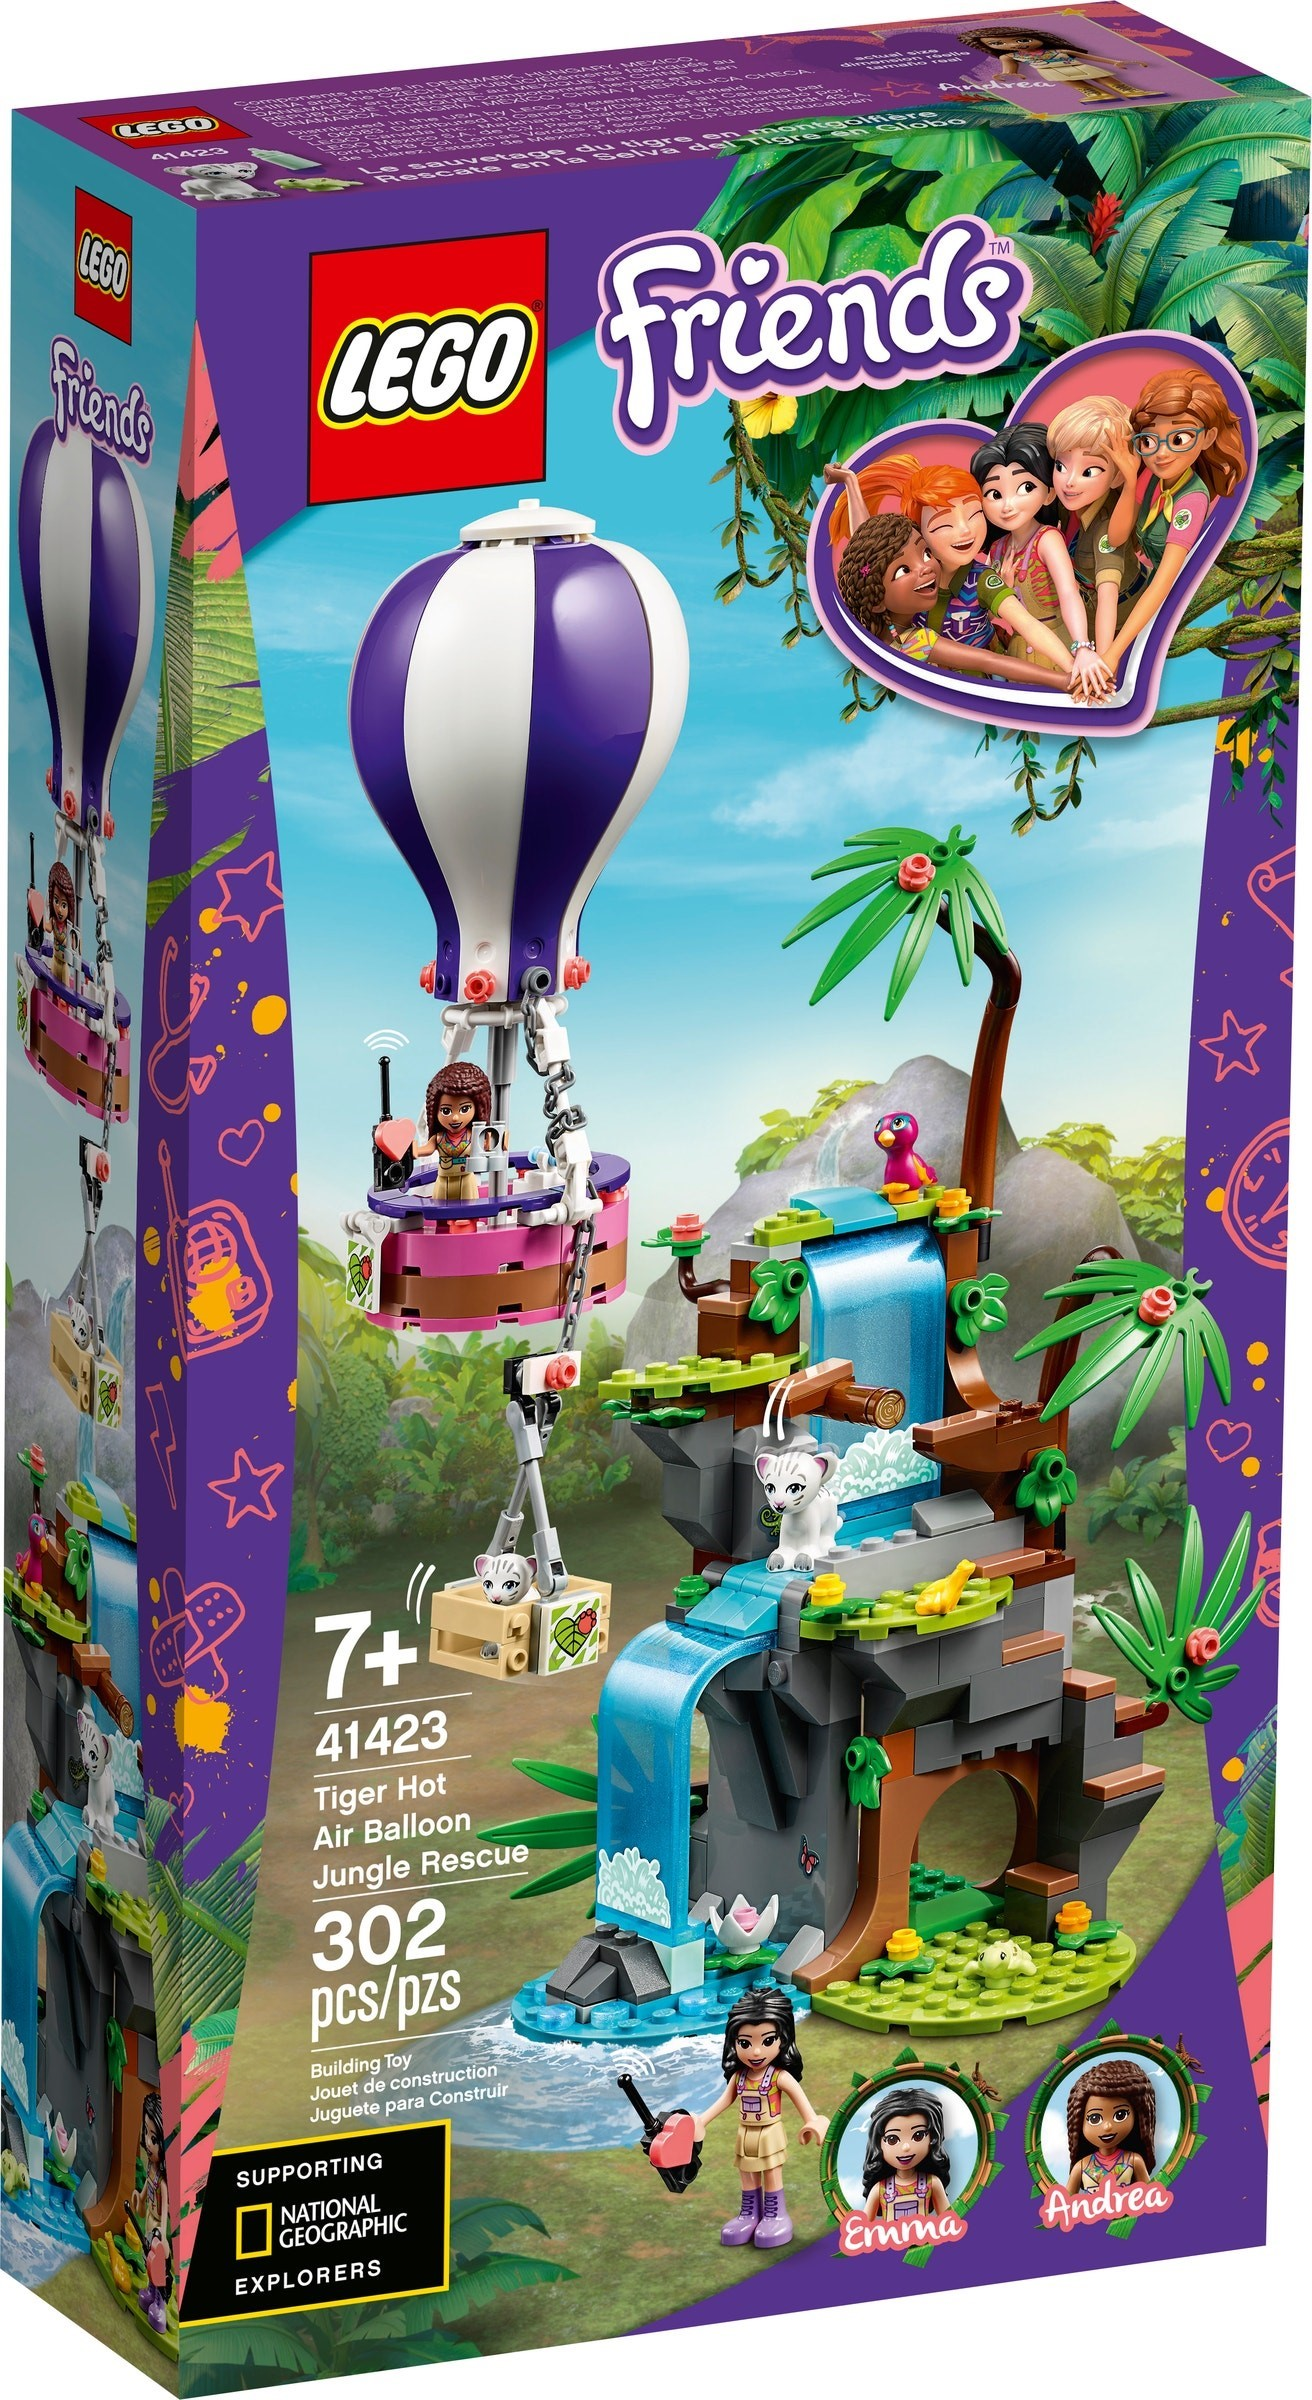 LEGO Friends - Tiger Hot Air Balloon Jungle Rescue (41423)